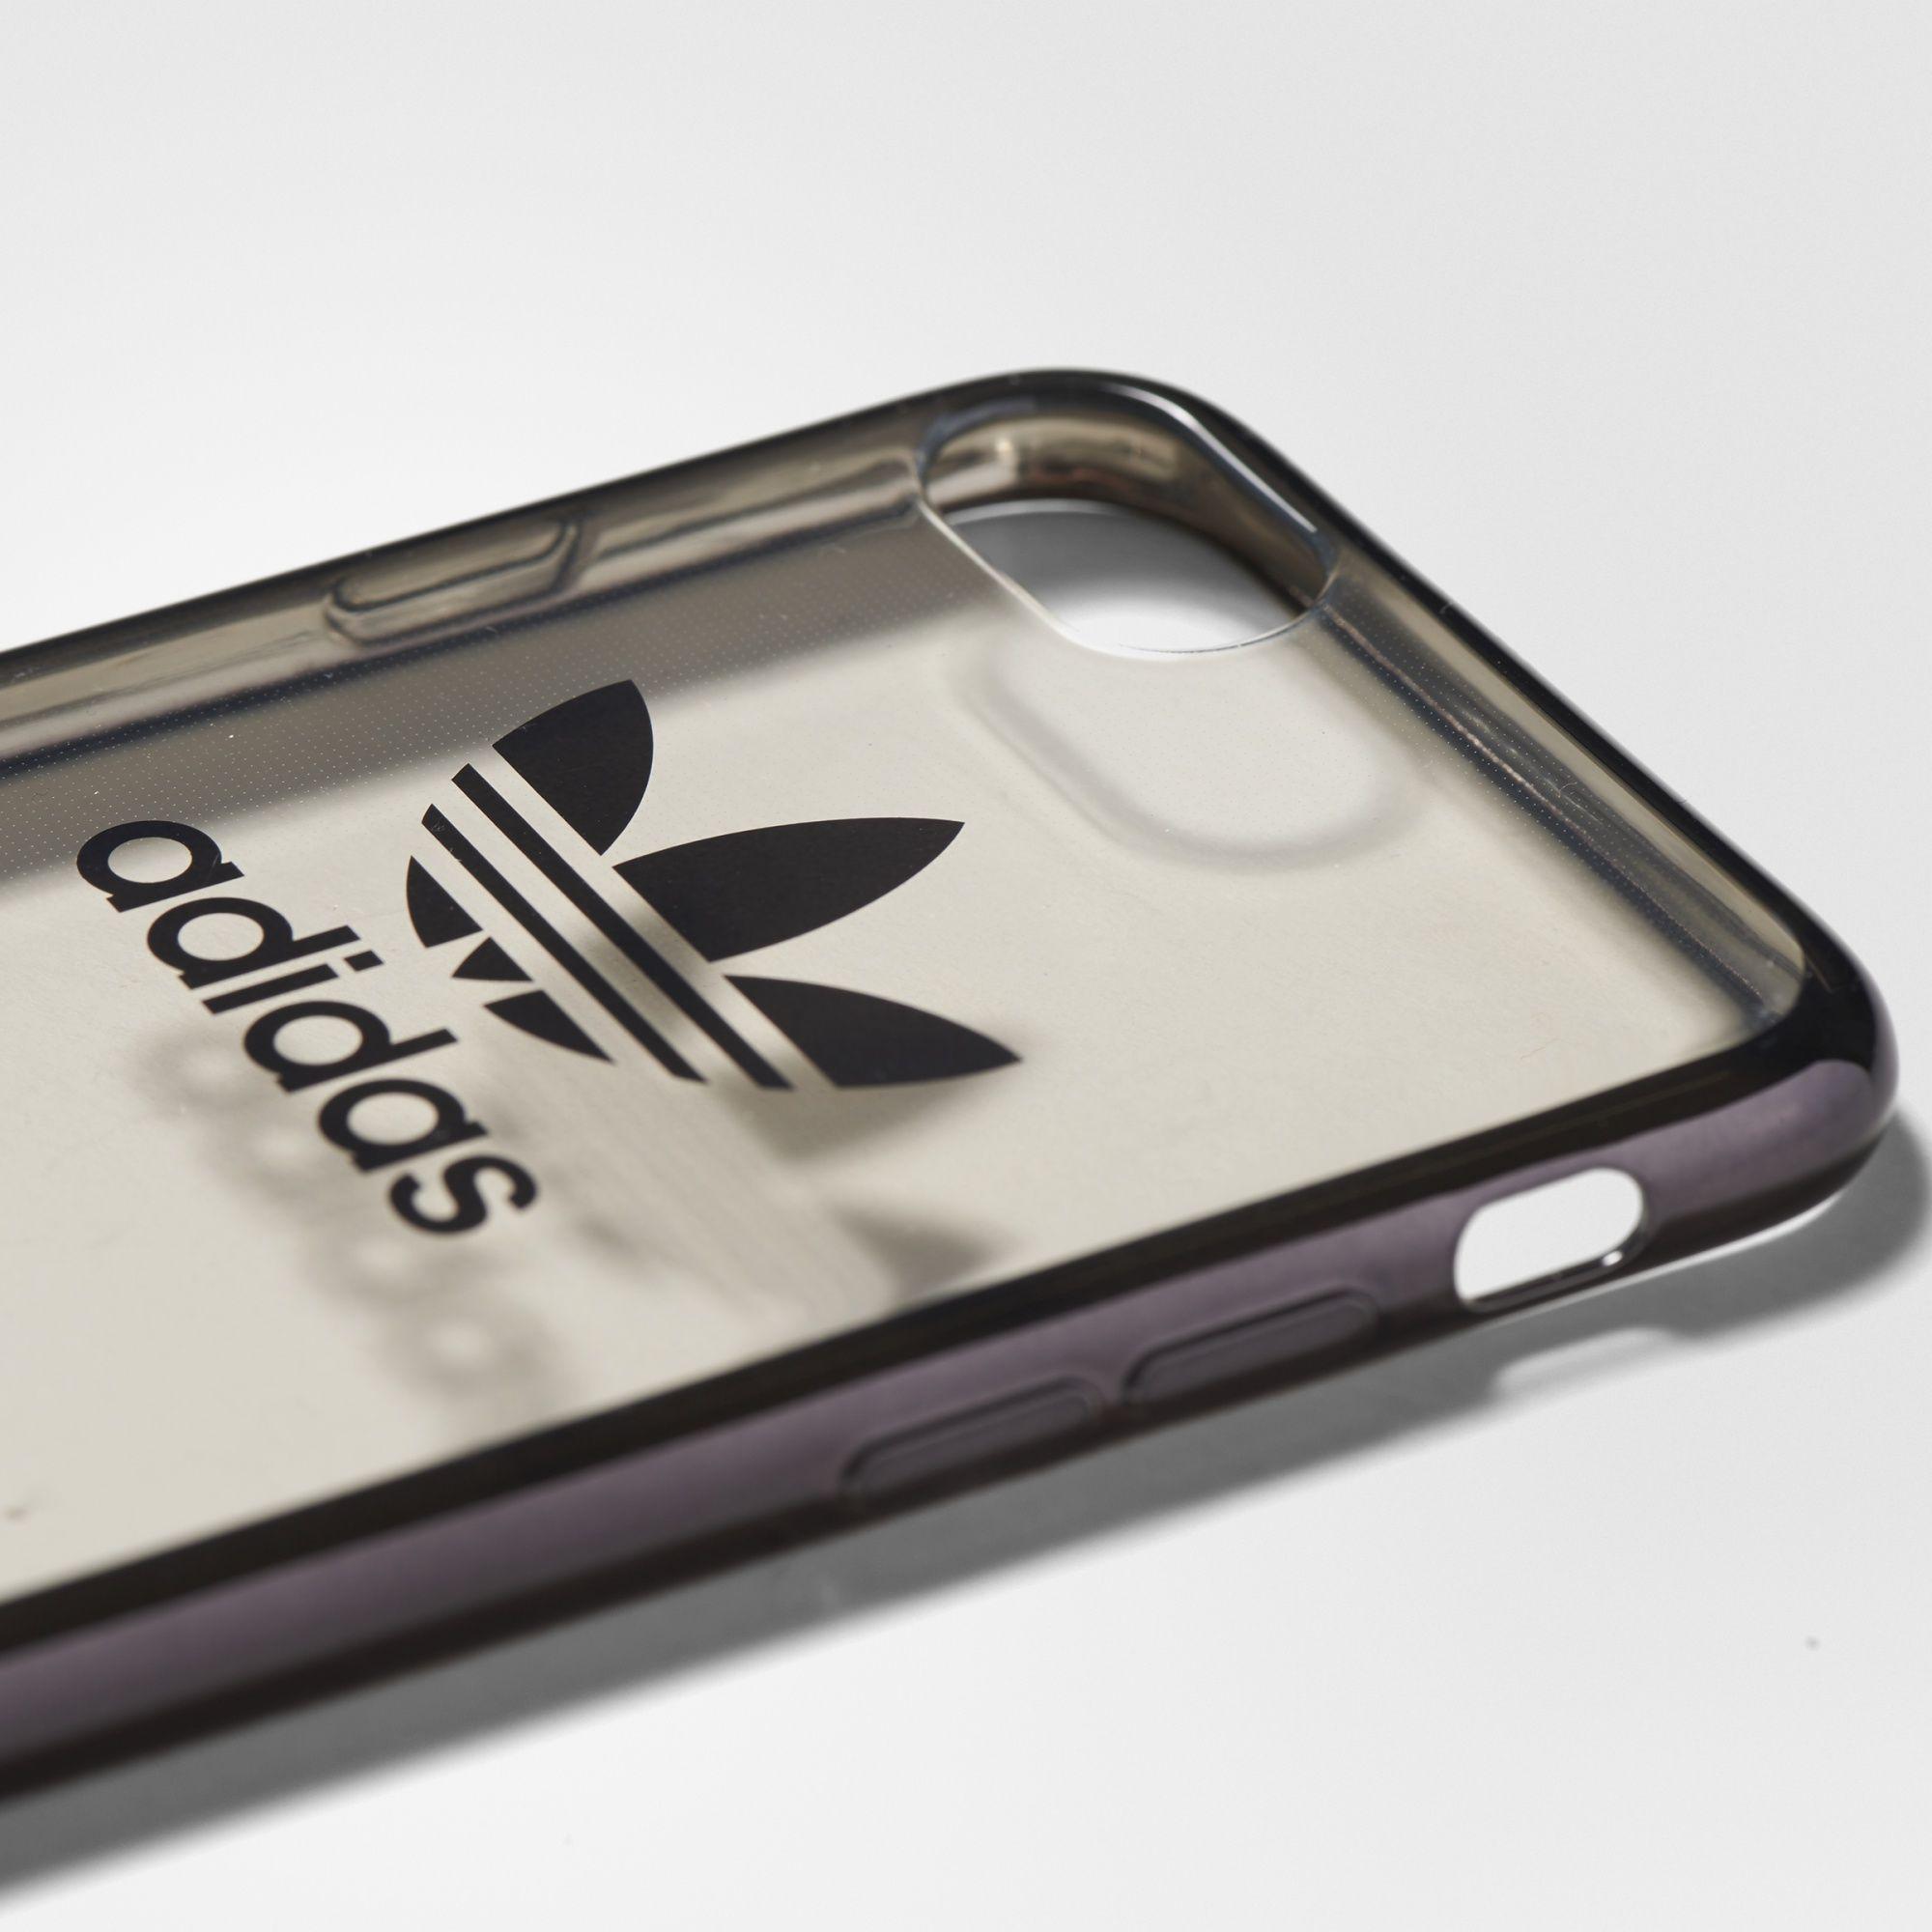 e495fdeb51ab adidas - Trefoil Clear Case iPhone 7